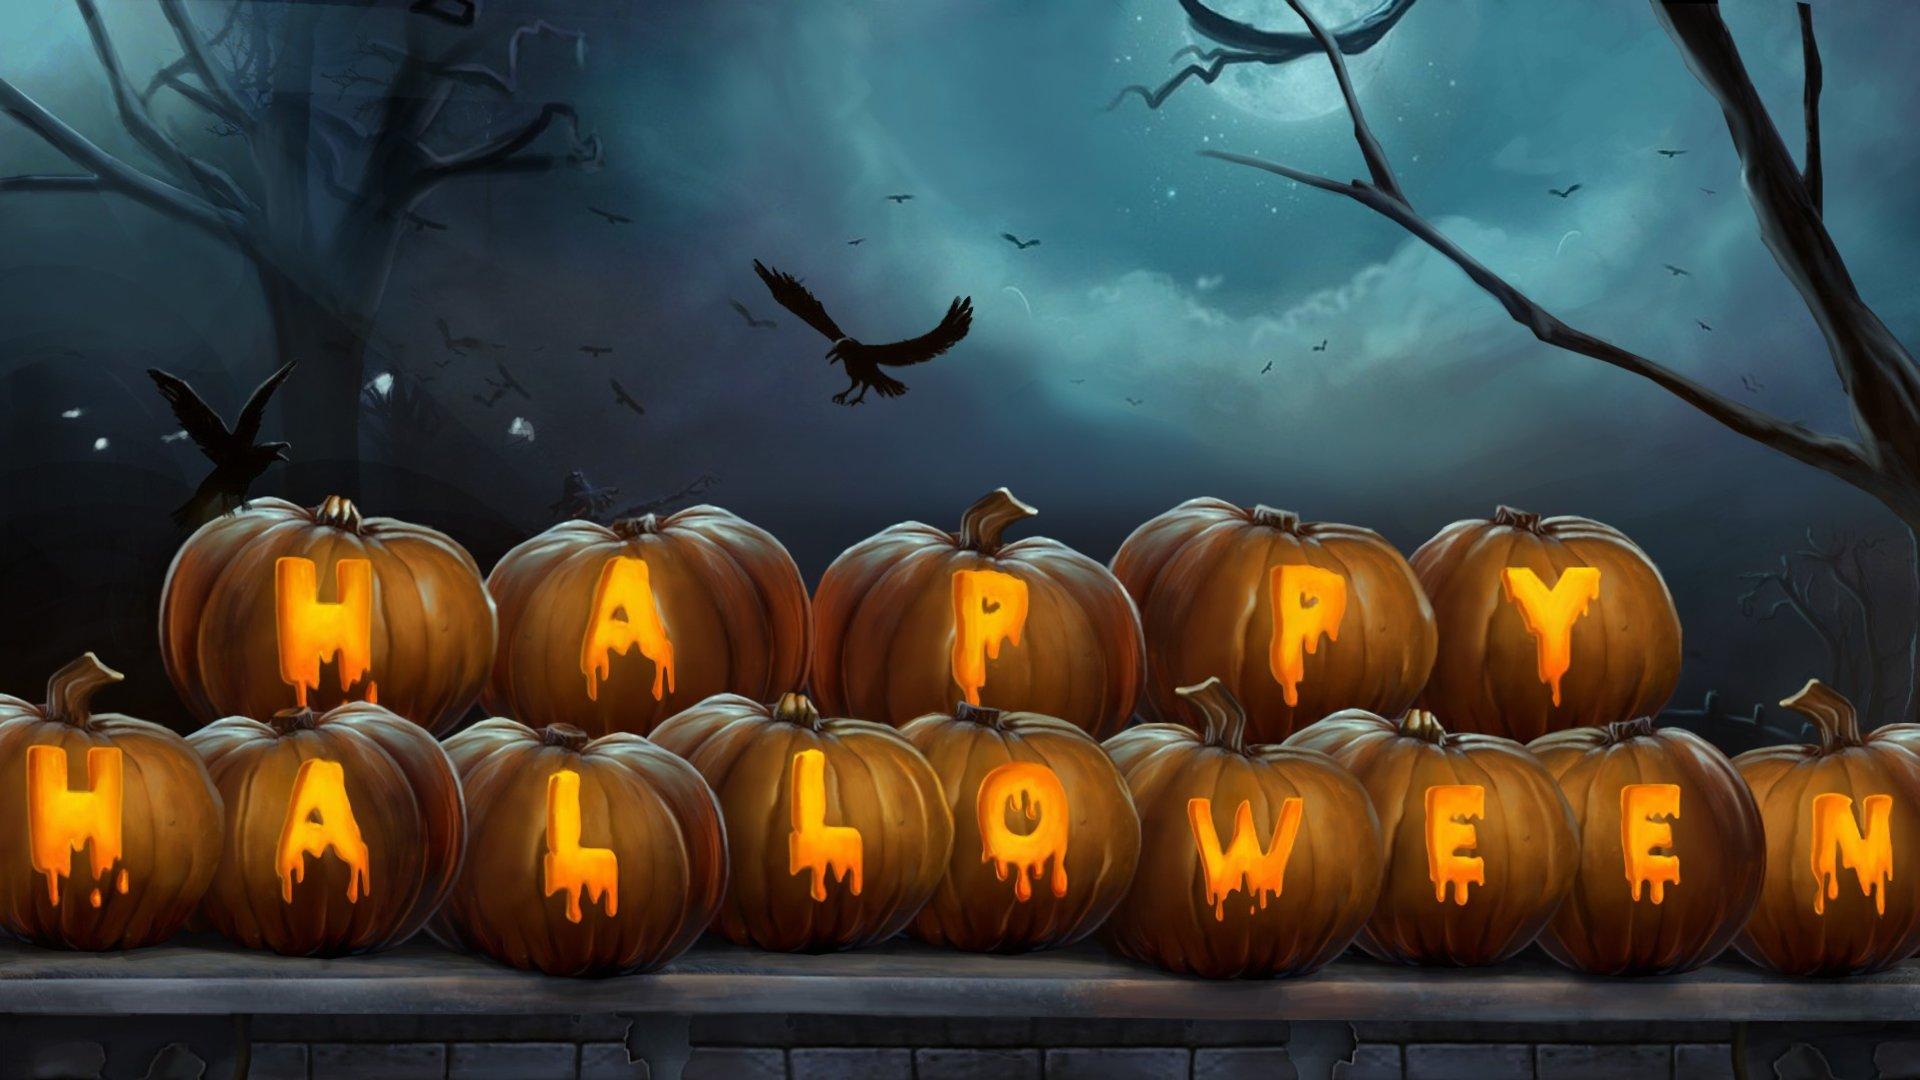 Halloween Images Hd.Happy Halloween Write On Pumpkins Hd Wallpaper